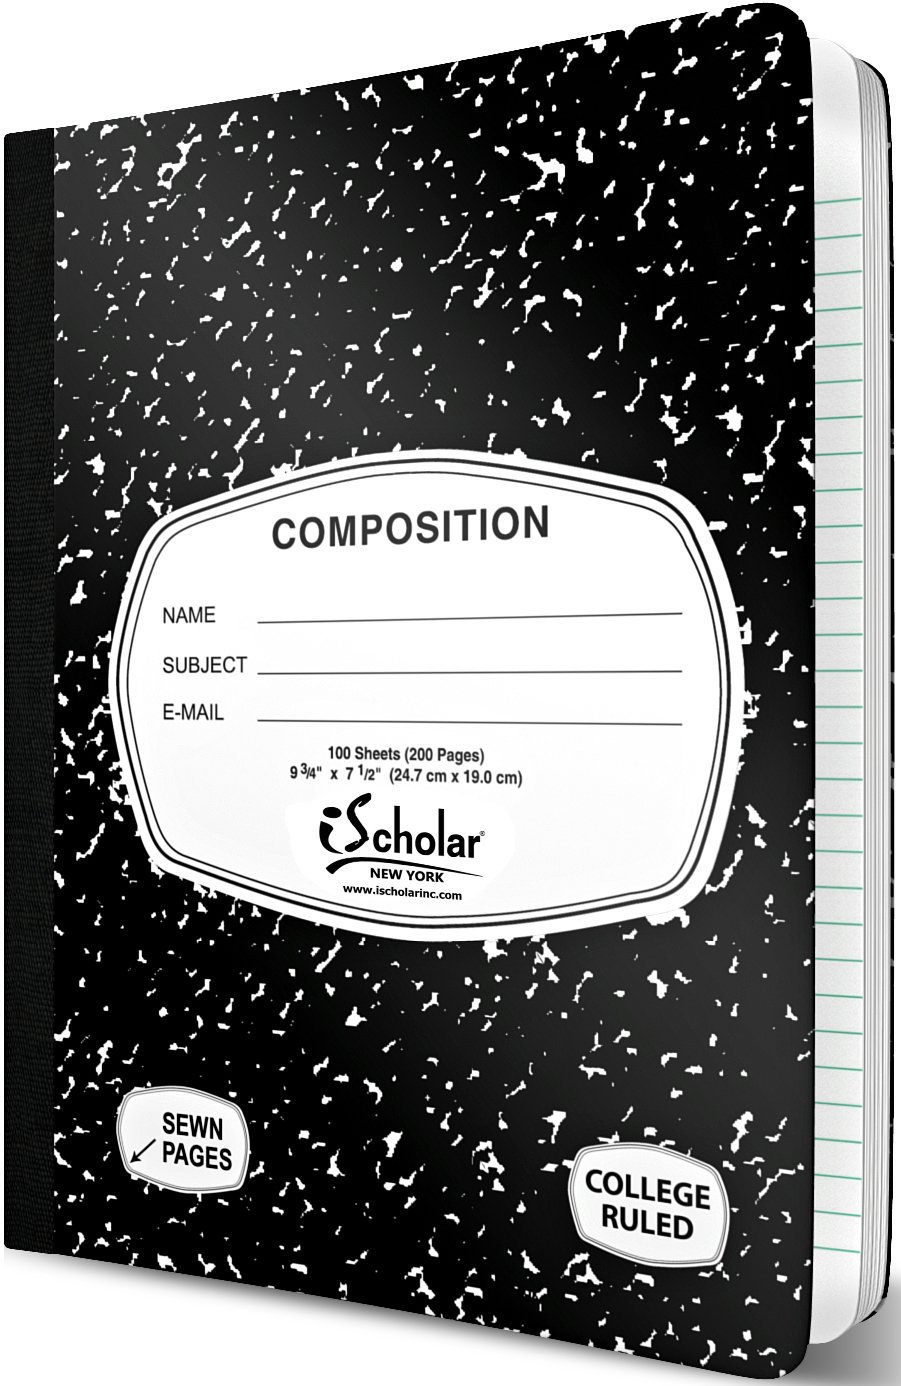 iScholar Composition Composition Composition College 7 5 Inches 10201 80f66c